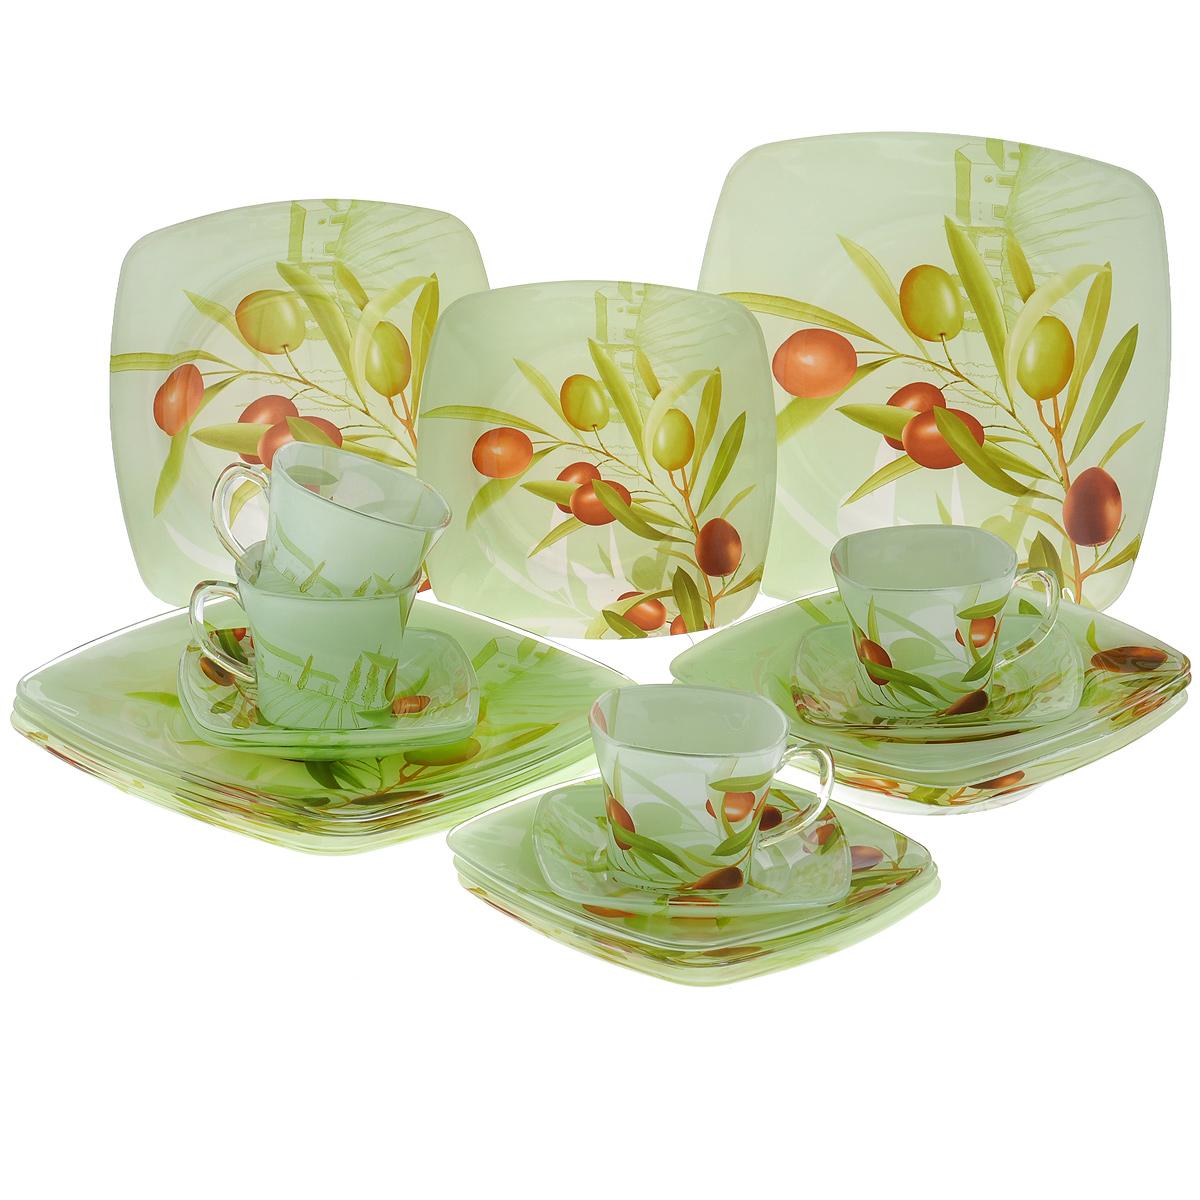 "Набор посуды ""Оливки"", 20 предметов, Porcelain Industry"